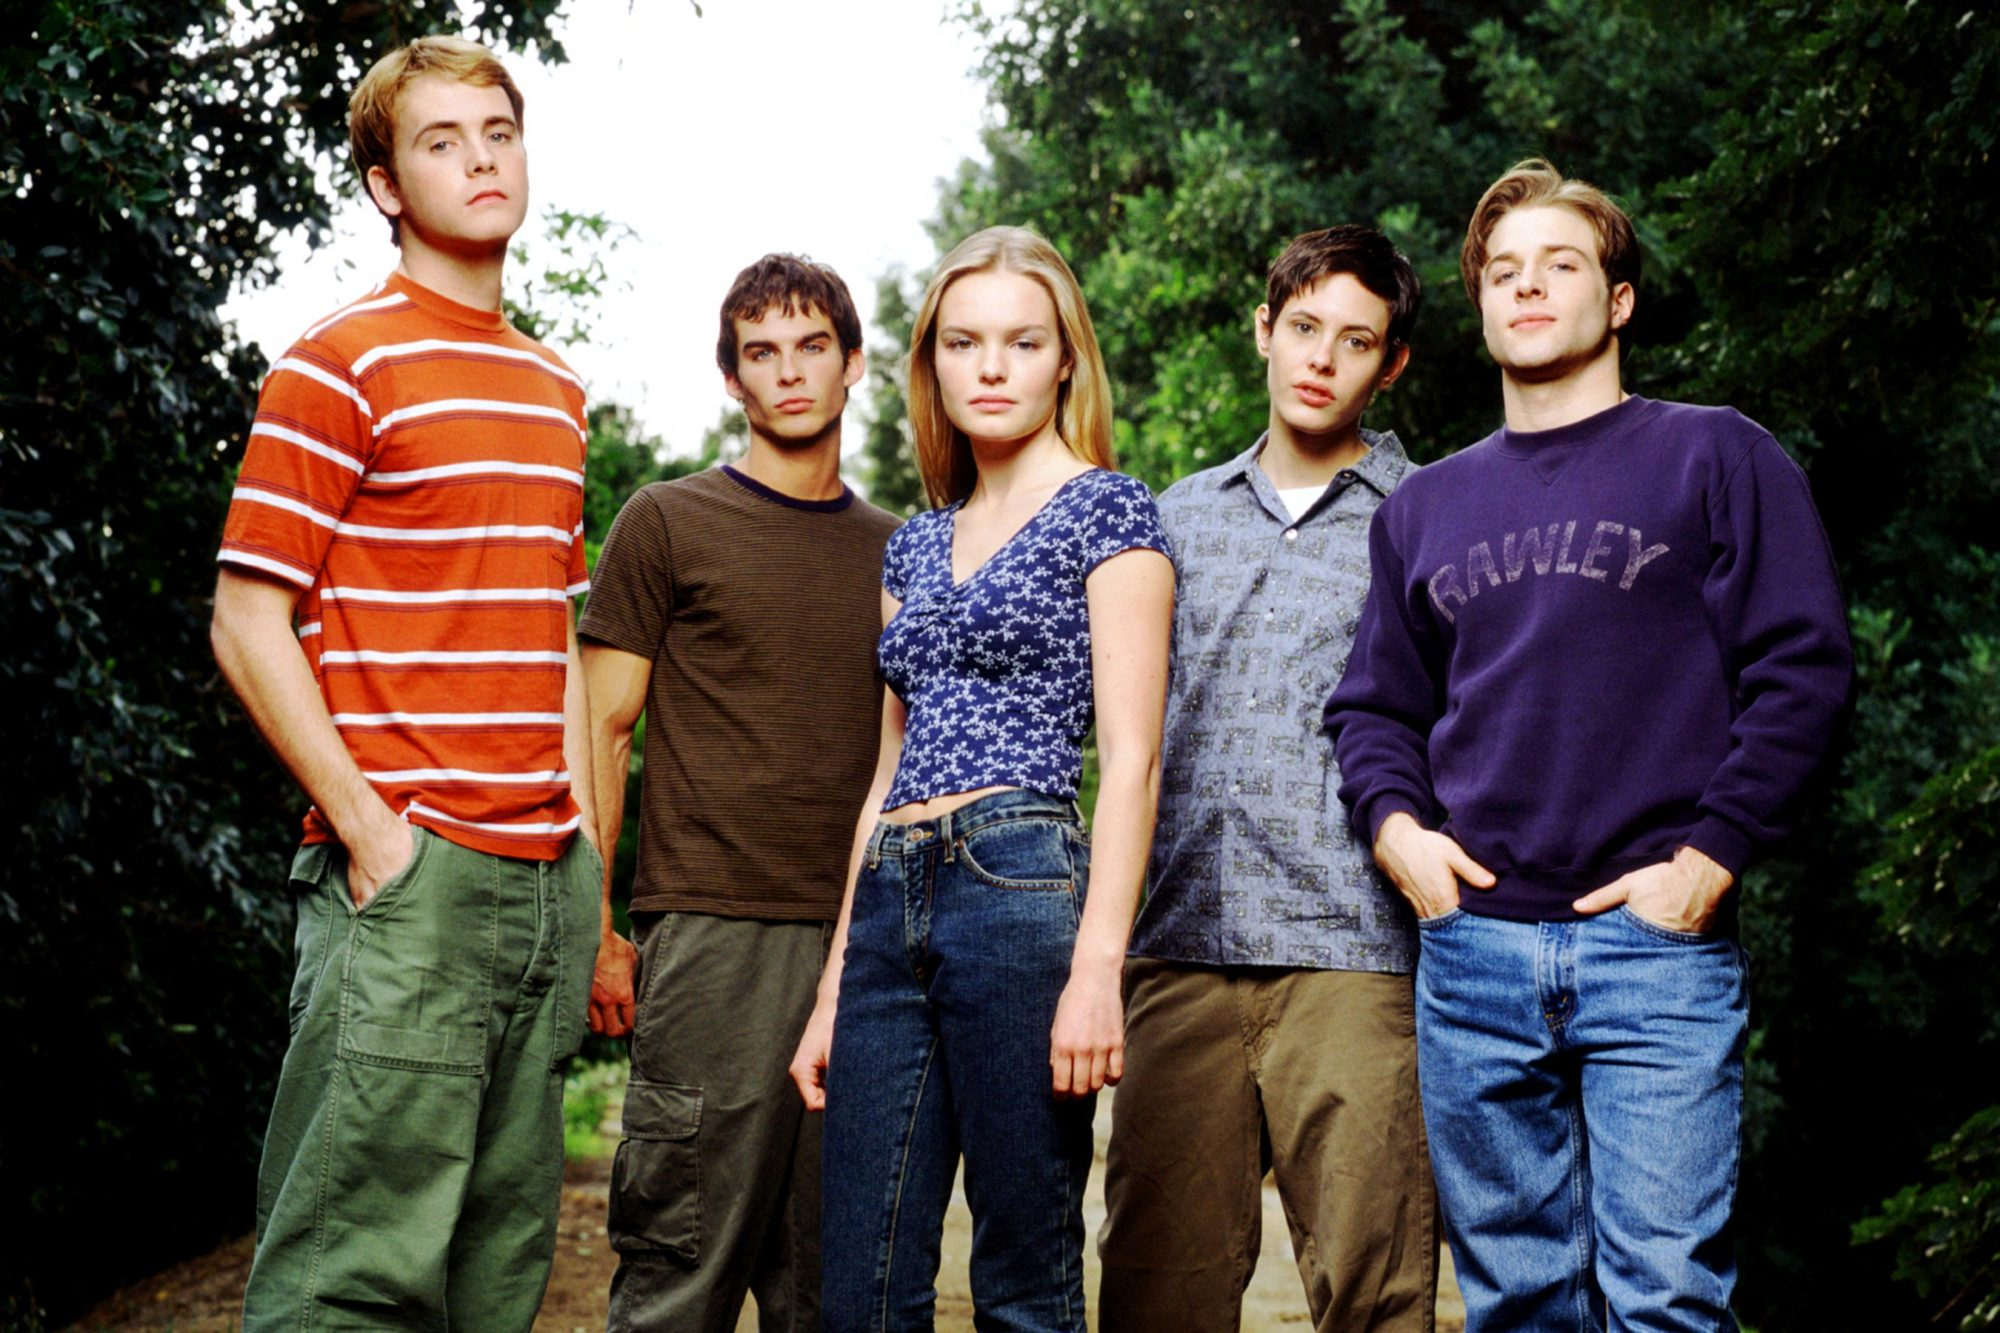 YOUNG AMERICANS, Rodney Scott, Ian Somerhalder, Kate Bosworth, Katherine Moennig, Mark Famiglietti,